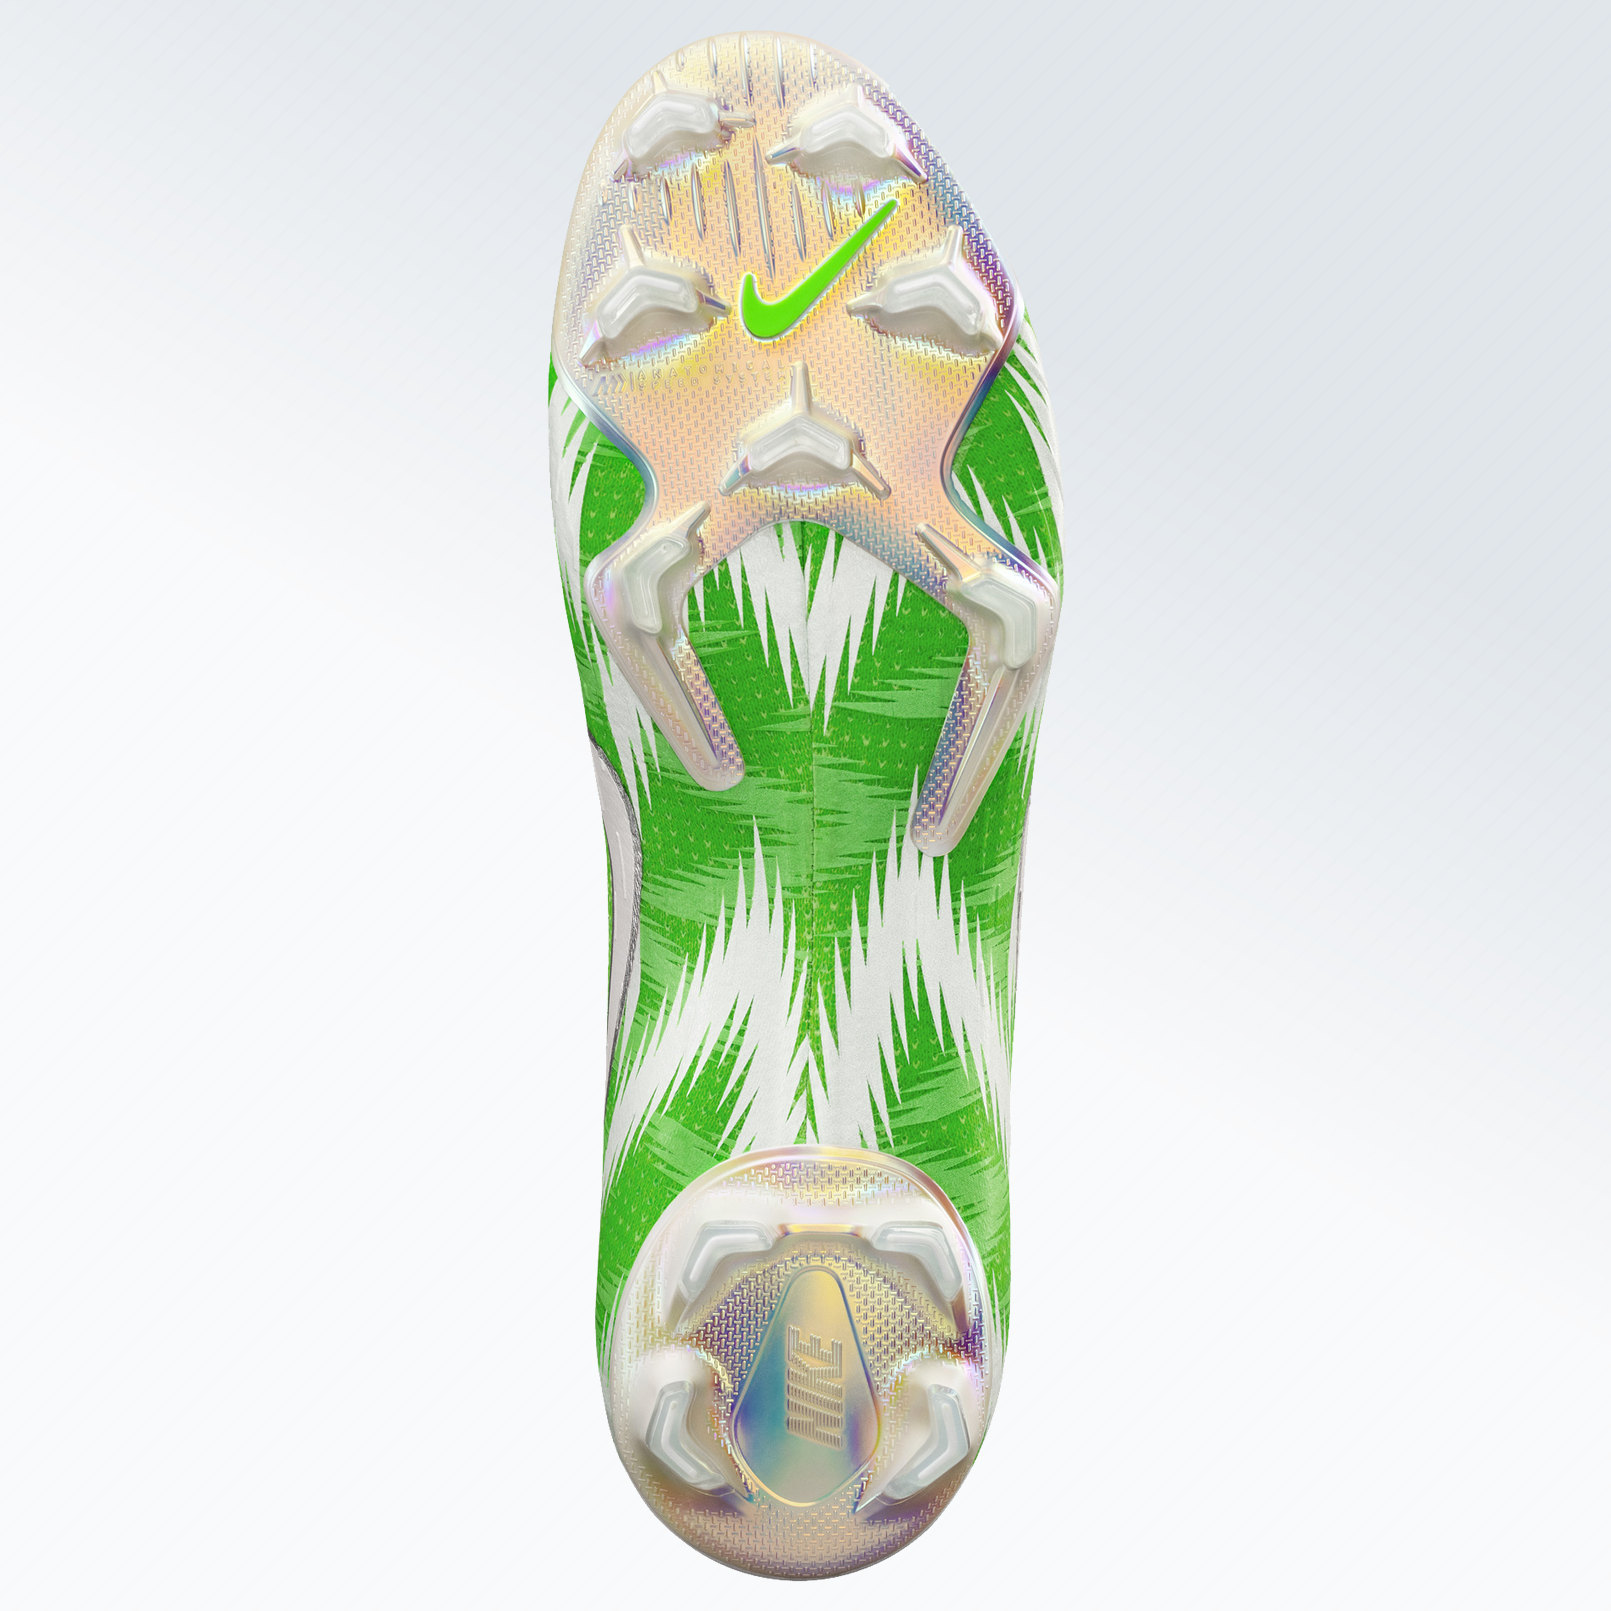 Botines Mercurial Superfly 360 NAIJA | Imagen Nike